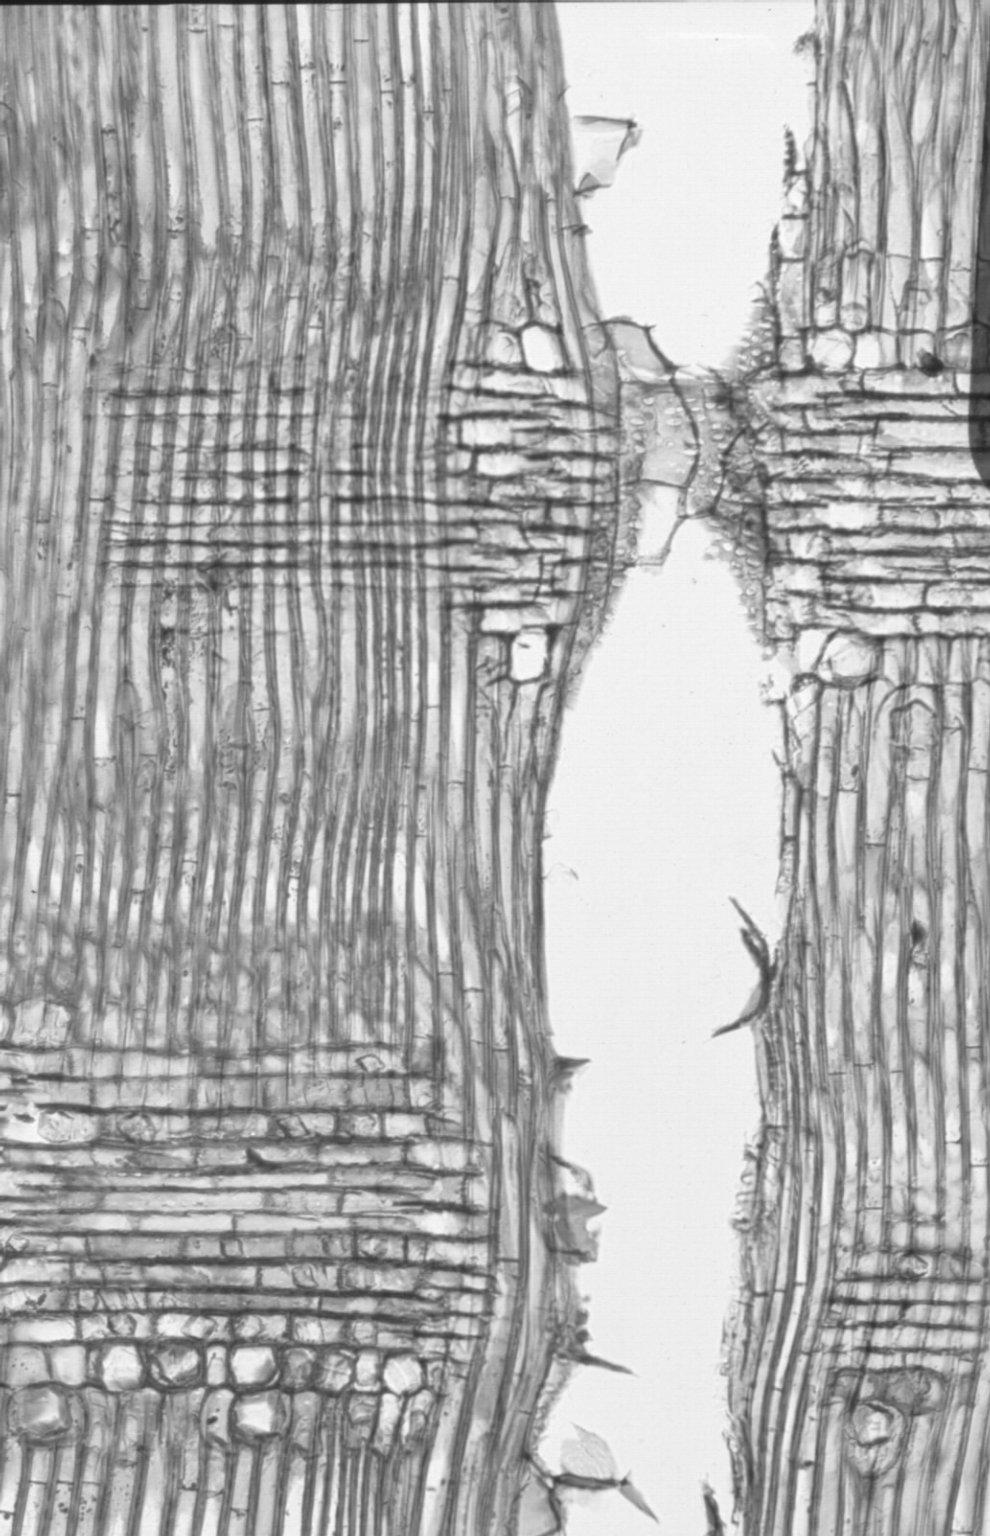 ANACARDIACEAE Lannea coromandelica